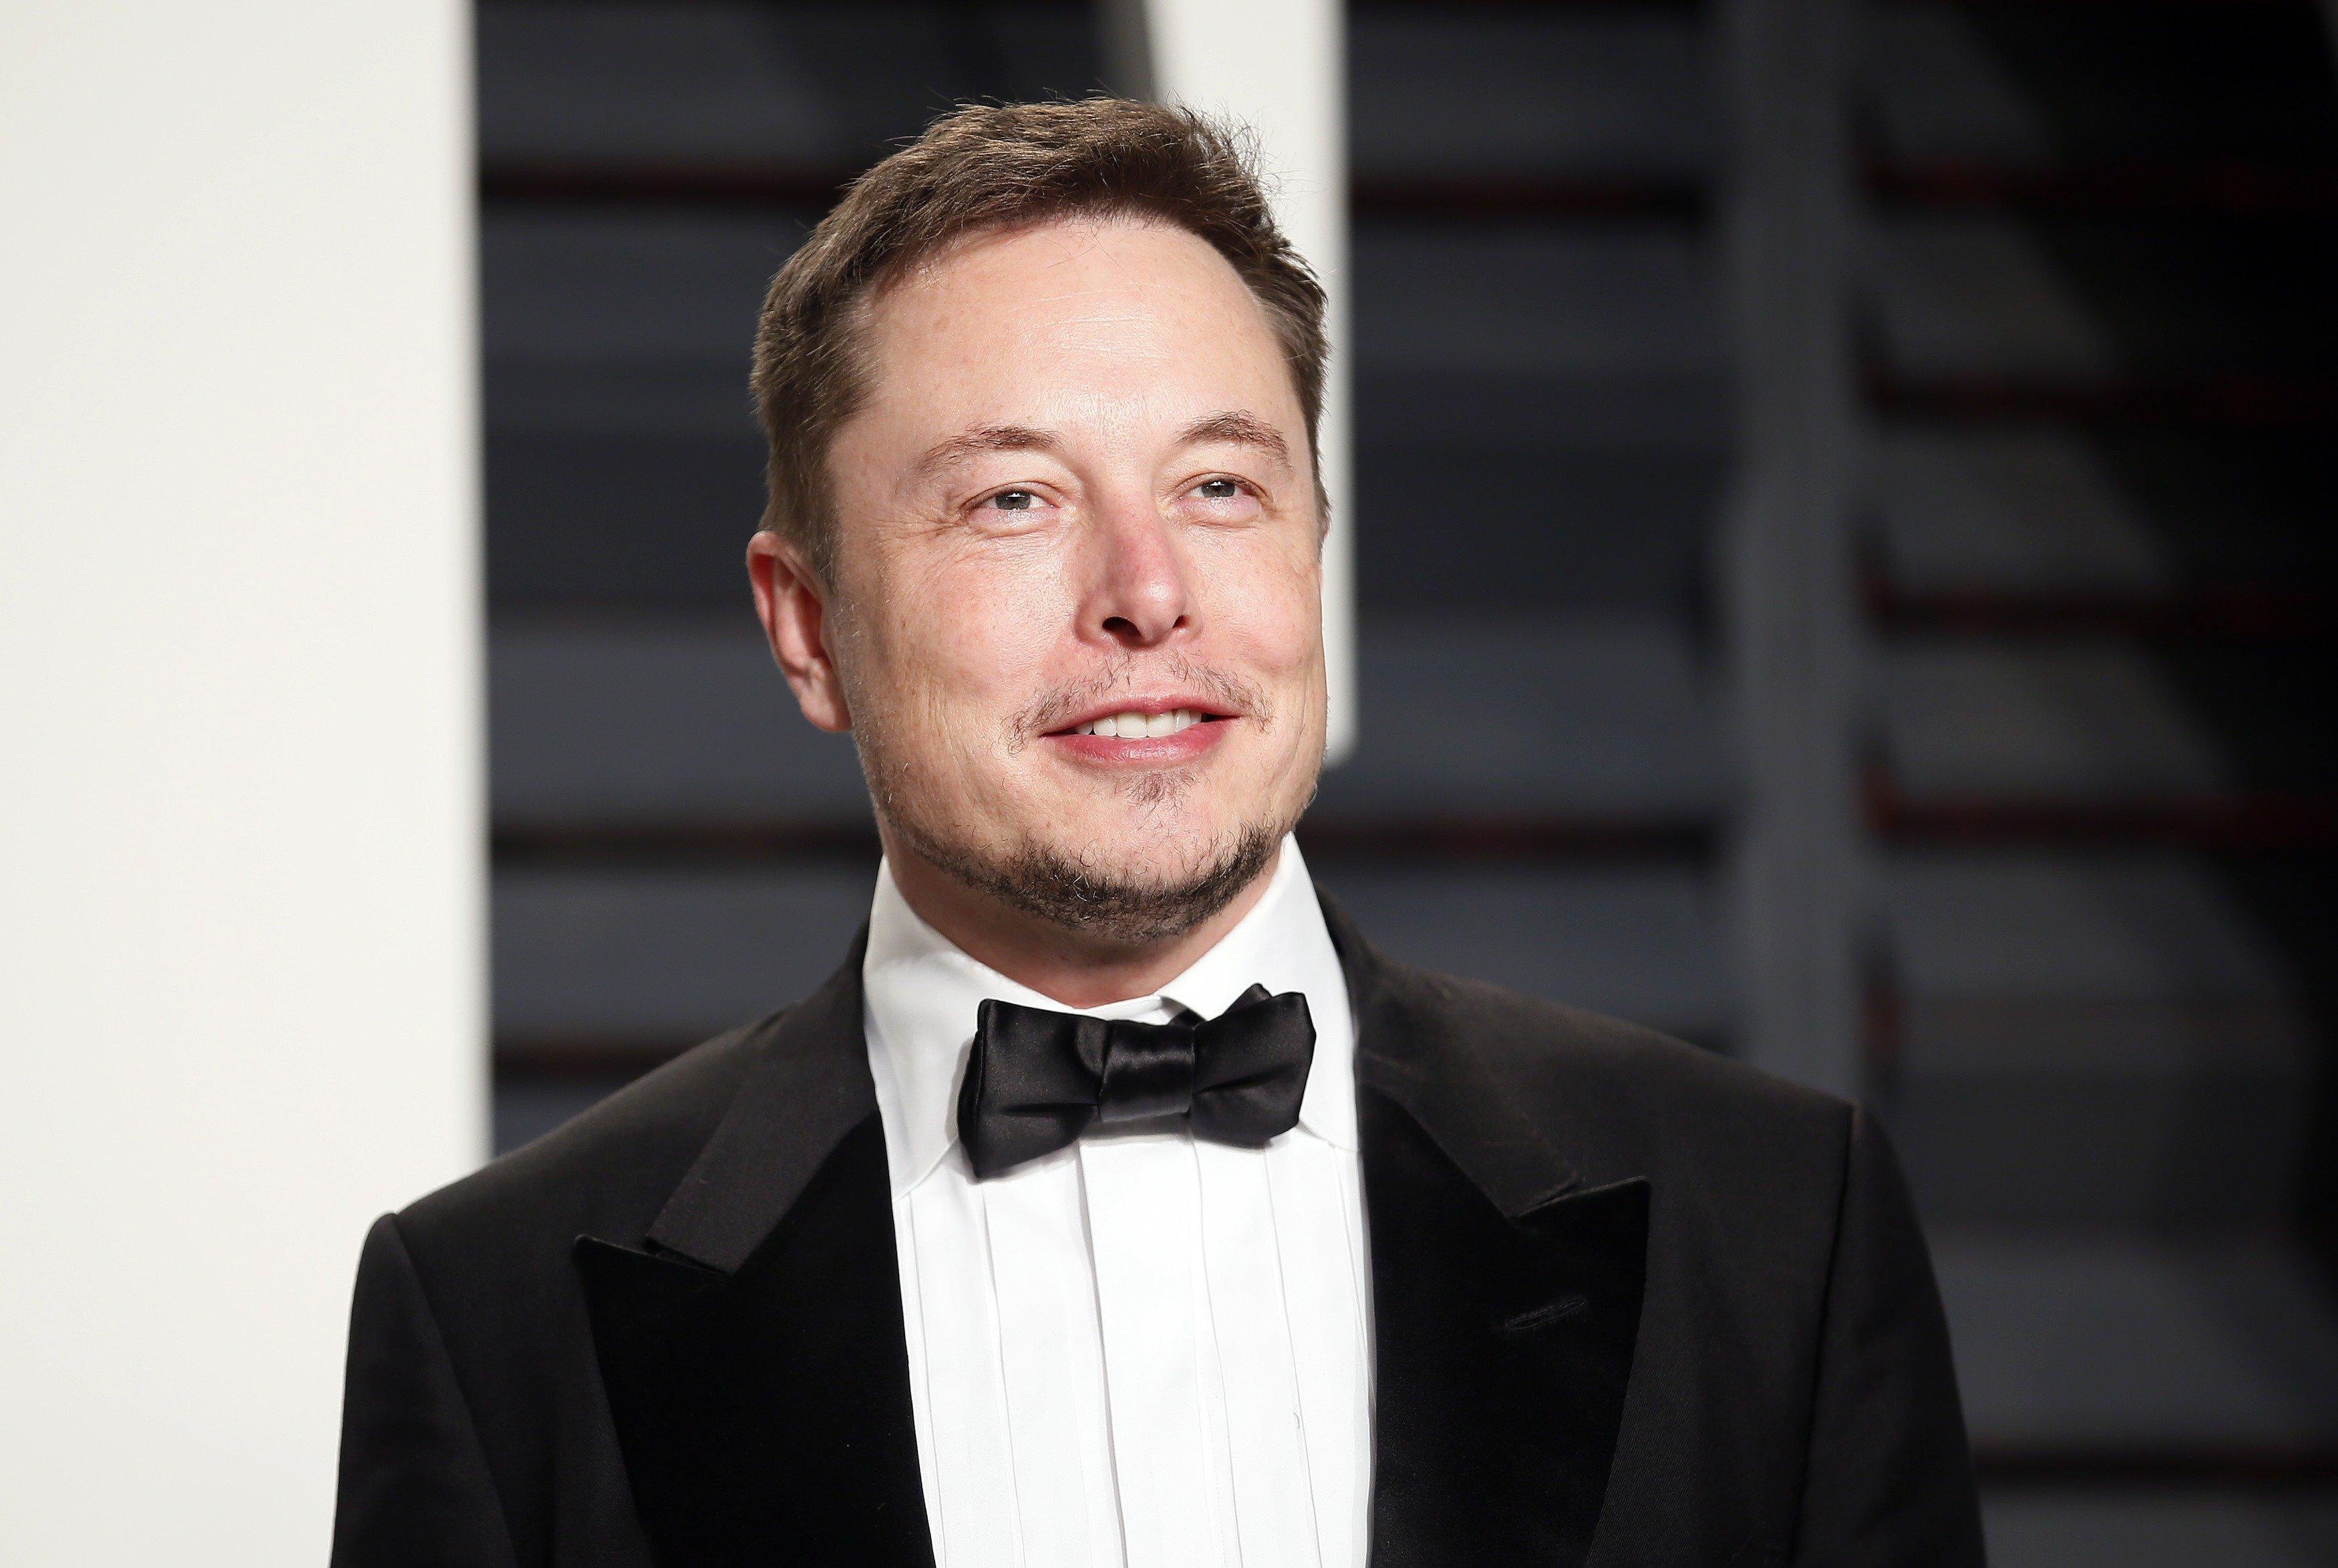 Elon Musk twitta Ethereum: test o scherzo?